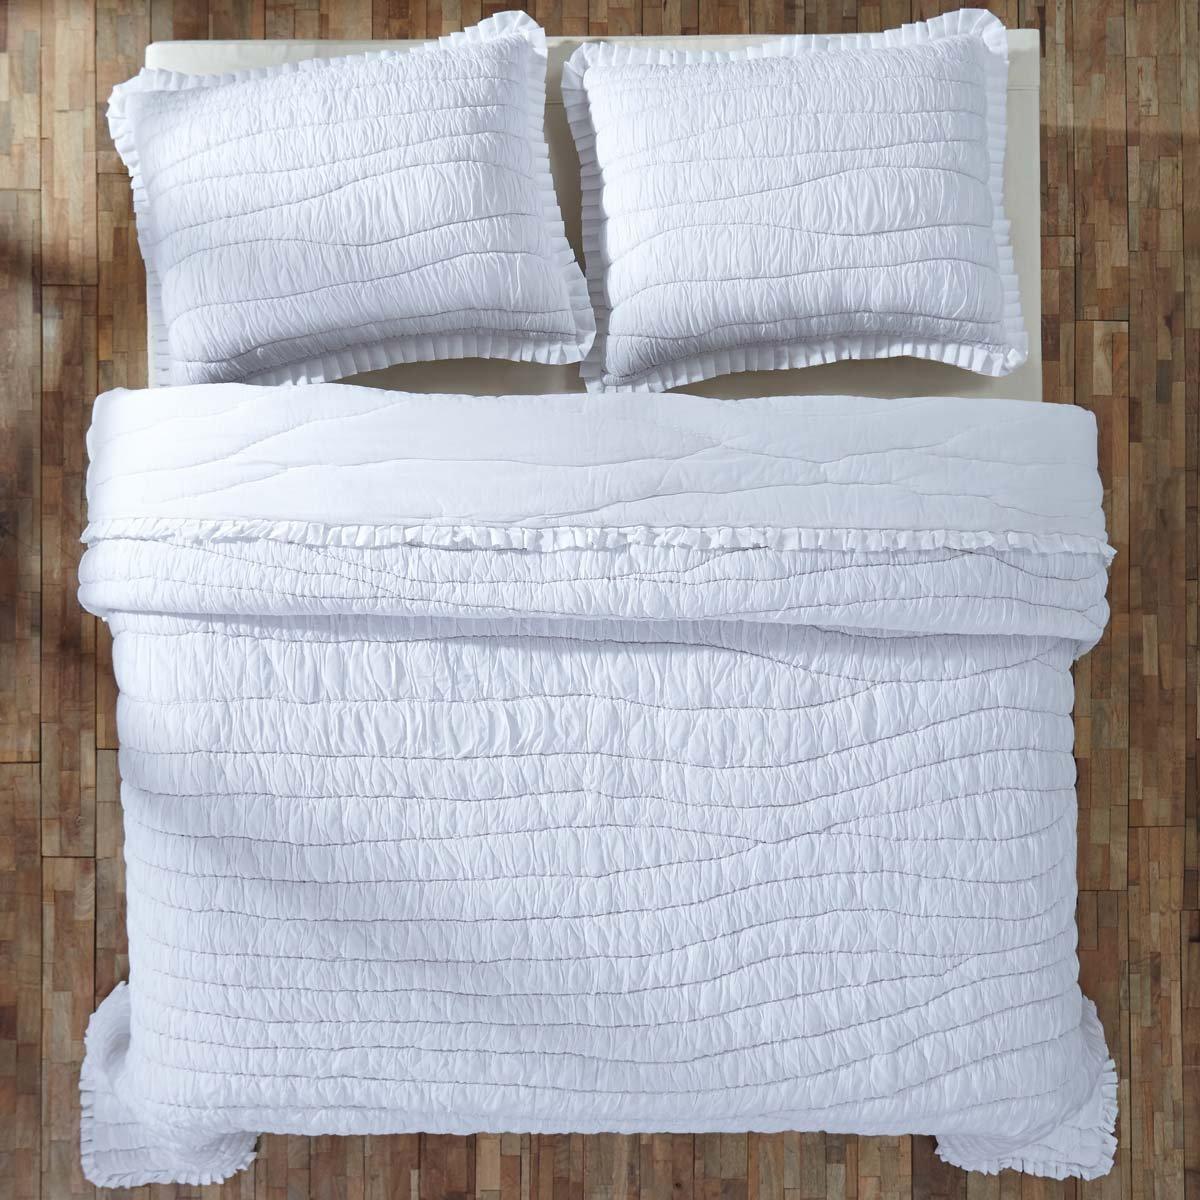 Aurora White Quilt King King 27277 VHC Brands Americana Farmhouse Bedding